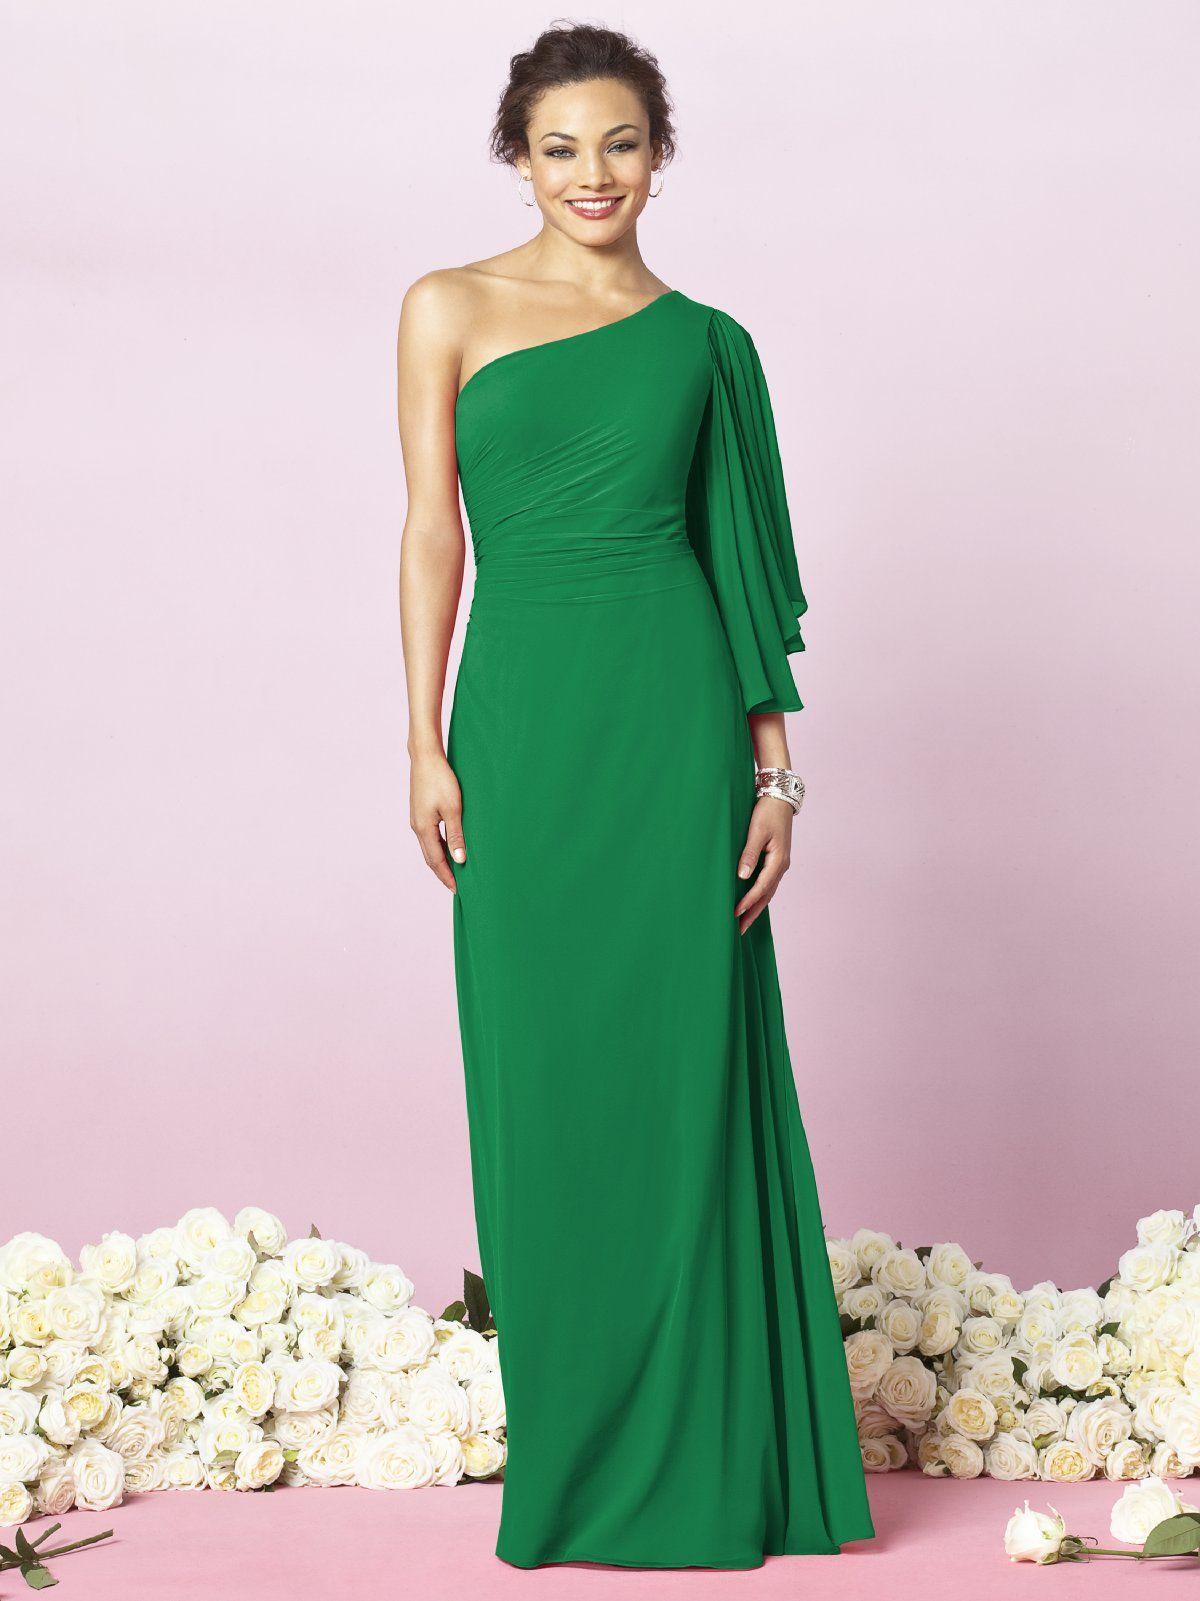 Love this dama de honor duties pinterest bridesmaid dress